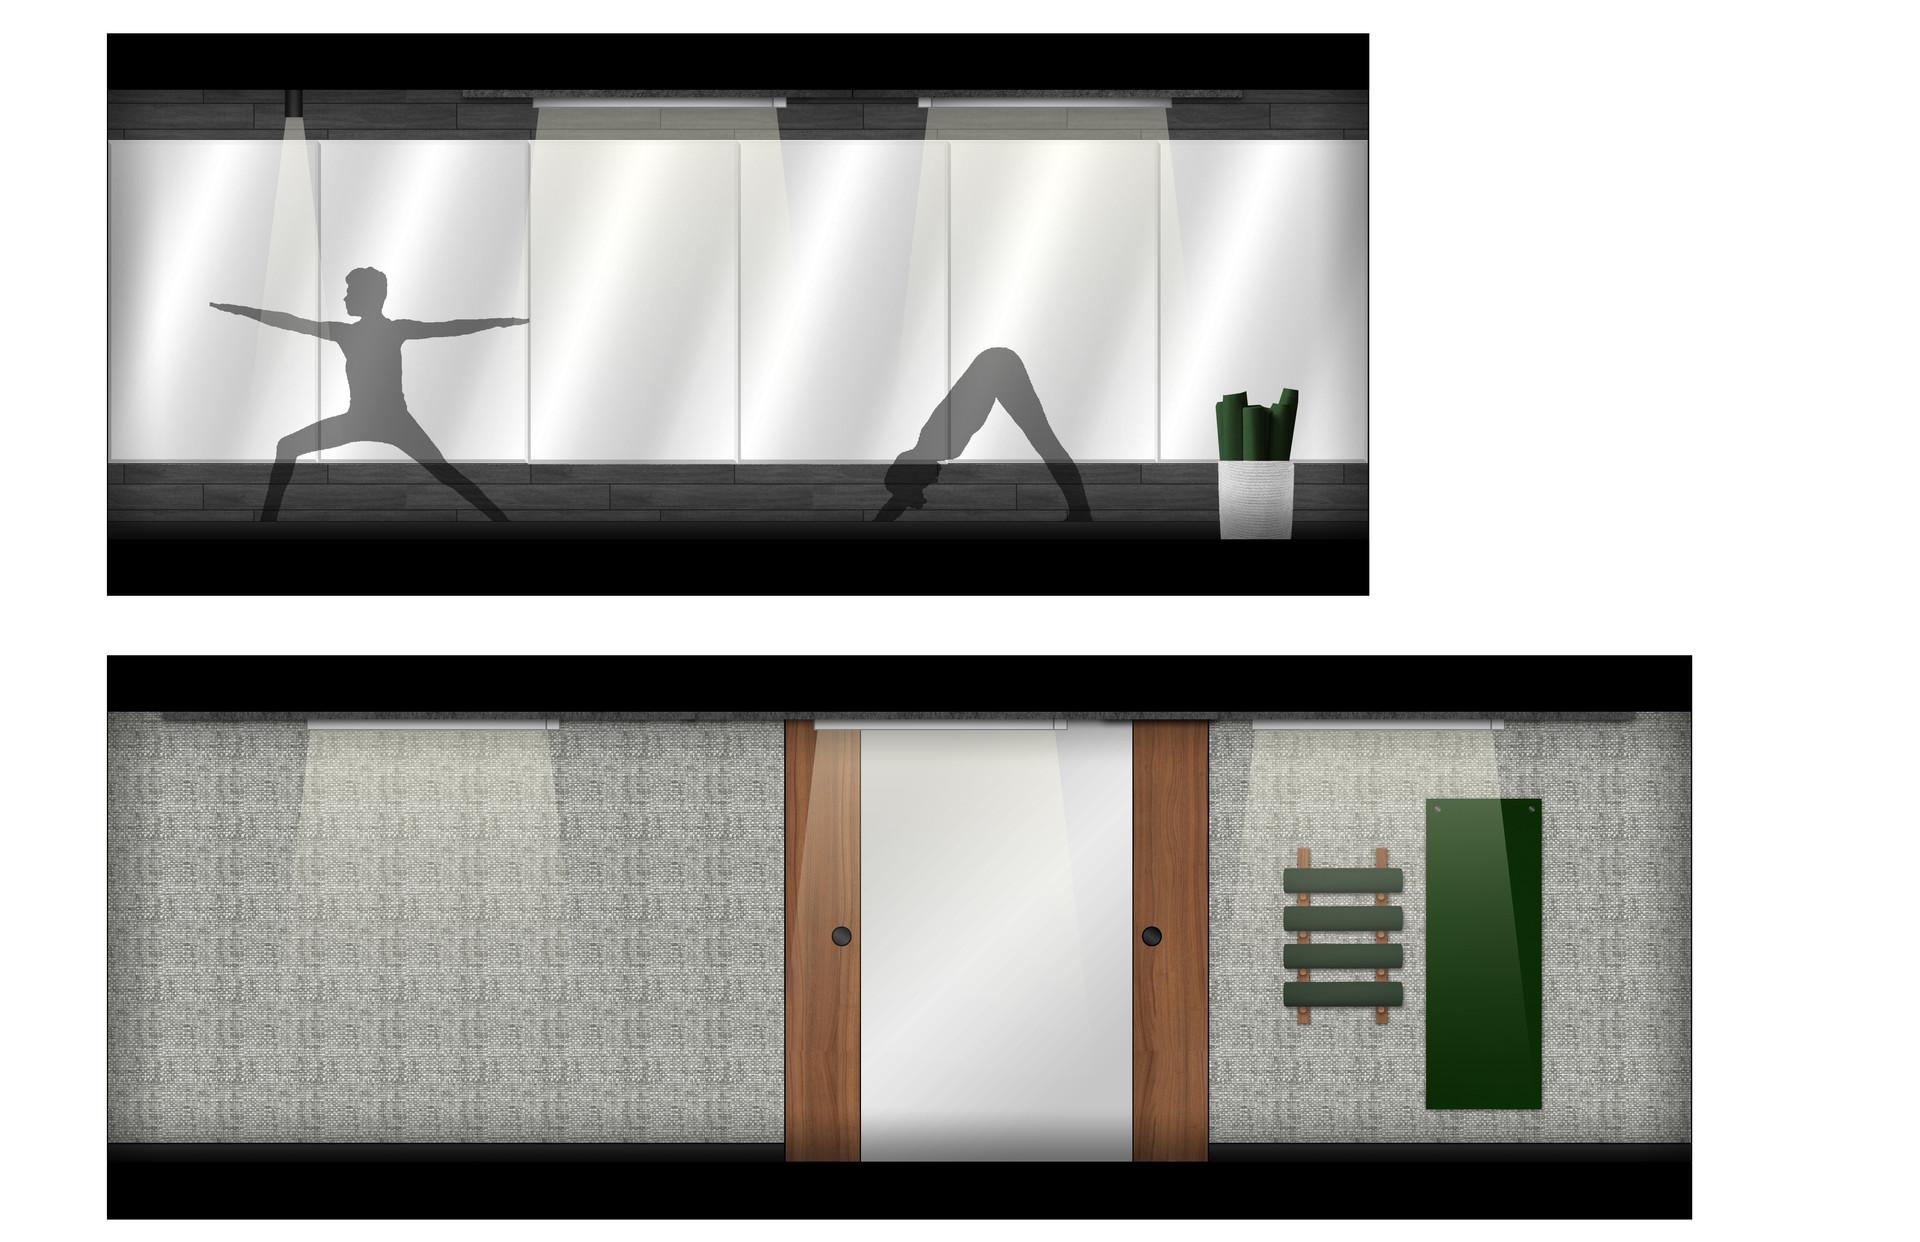 LVL 2 Yoga Room_Green Accent.jpg